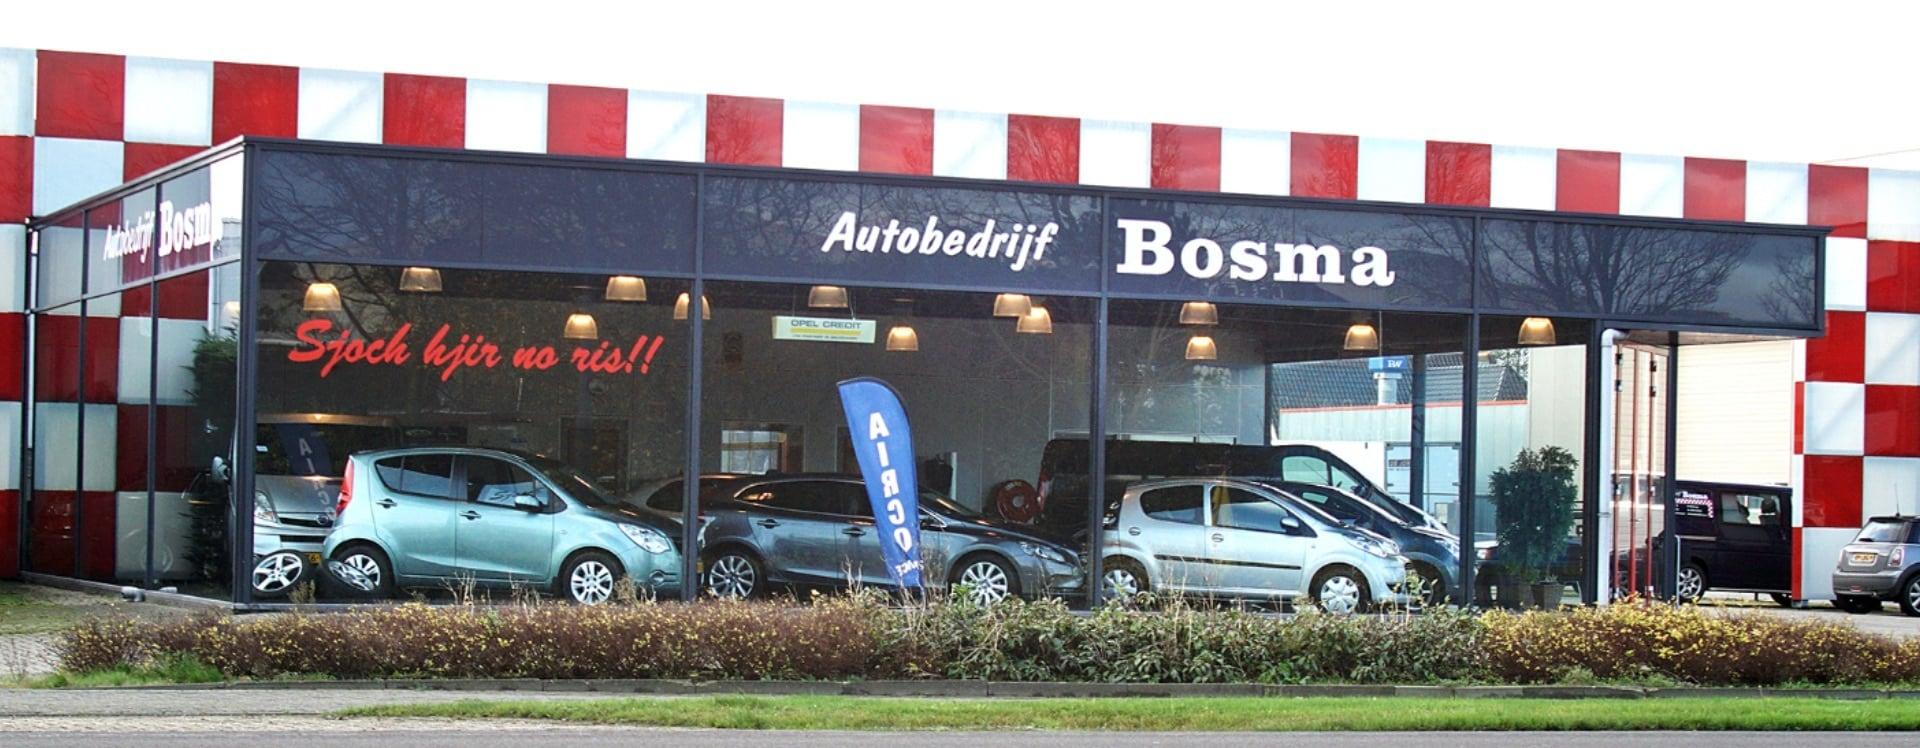 Autobedrijf Bosma Sint Nyk BV